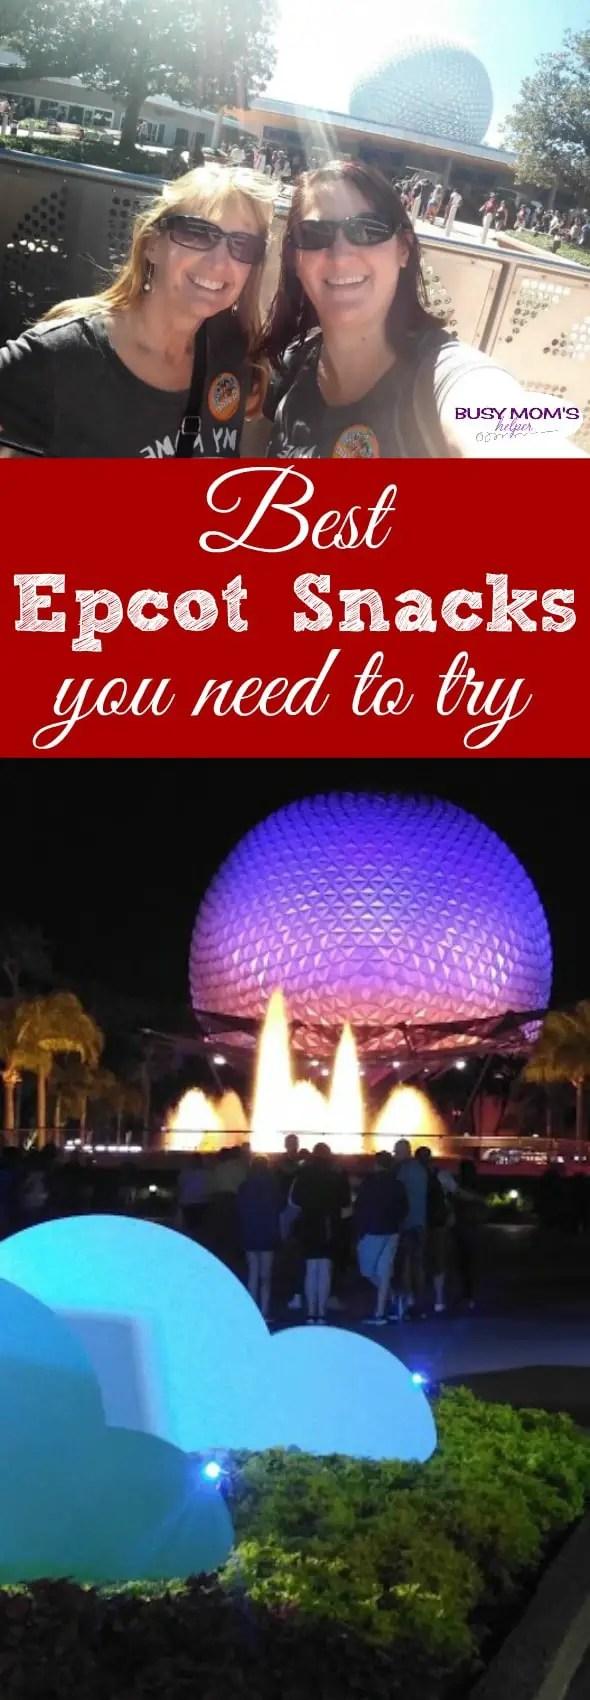 The BEST Epcot Snacks you need to try #epcot #waltdisneyworld #wdw #travel #familytravel